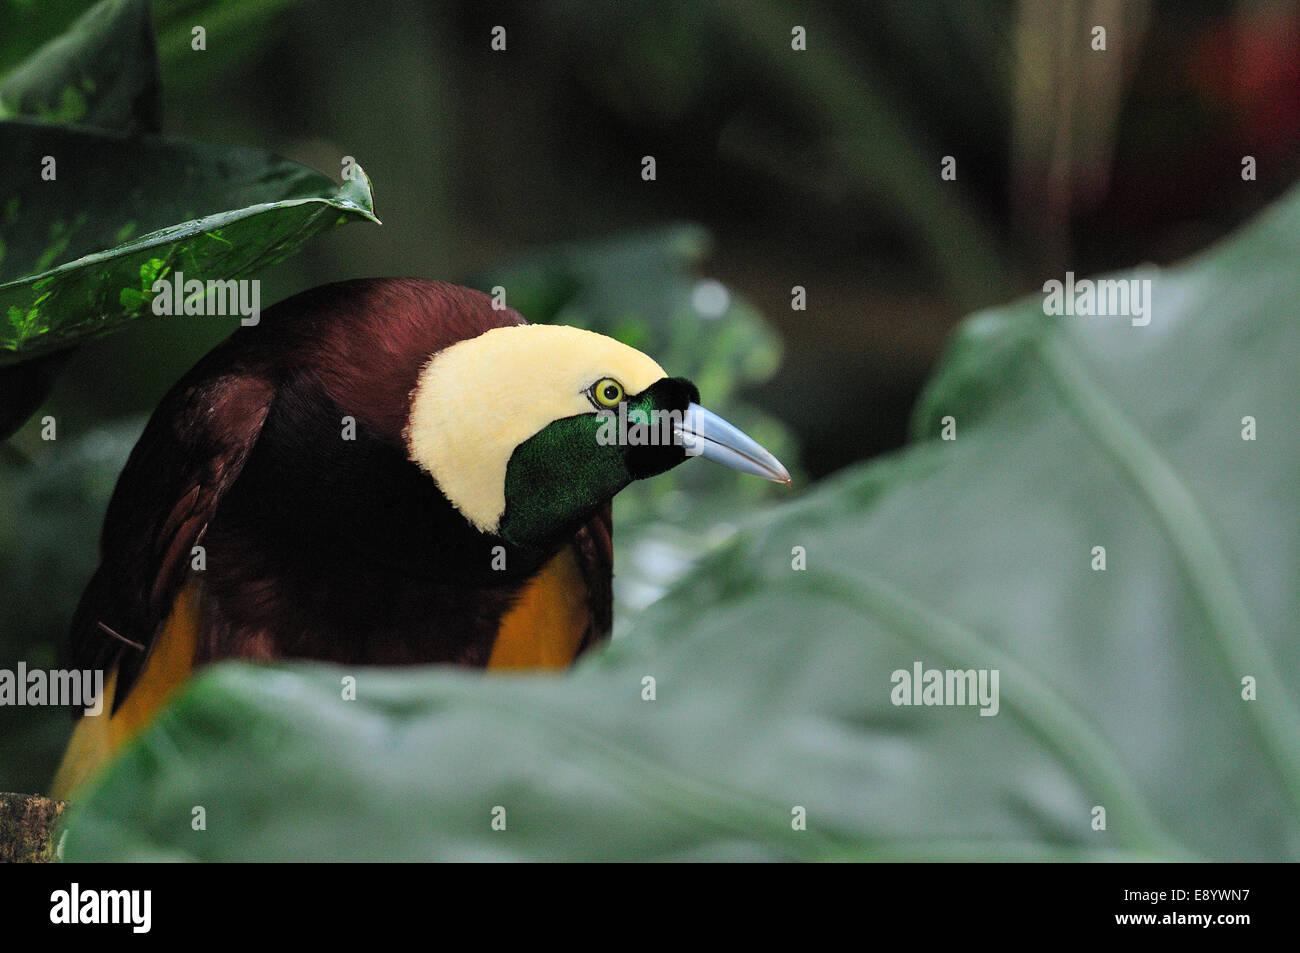 Greater bird-of-paradise, Paradisea apoda, Parasidaeidae uccello del paradiso, uccelli, Bali, Indonesia - Stock Image